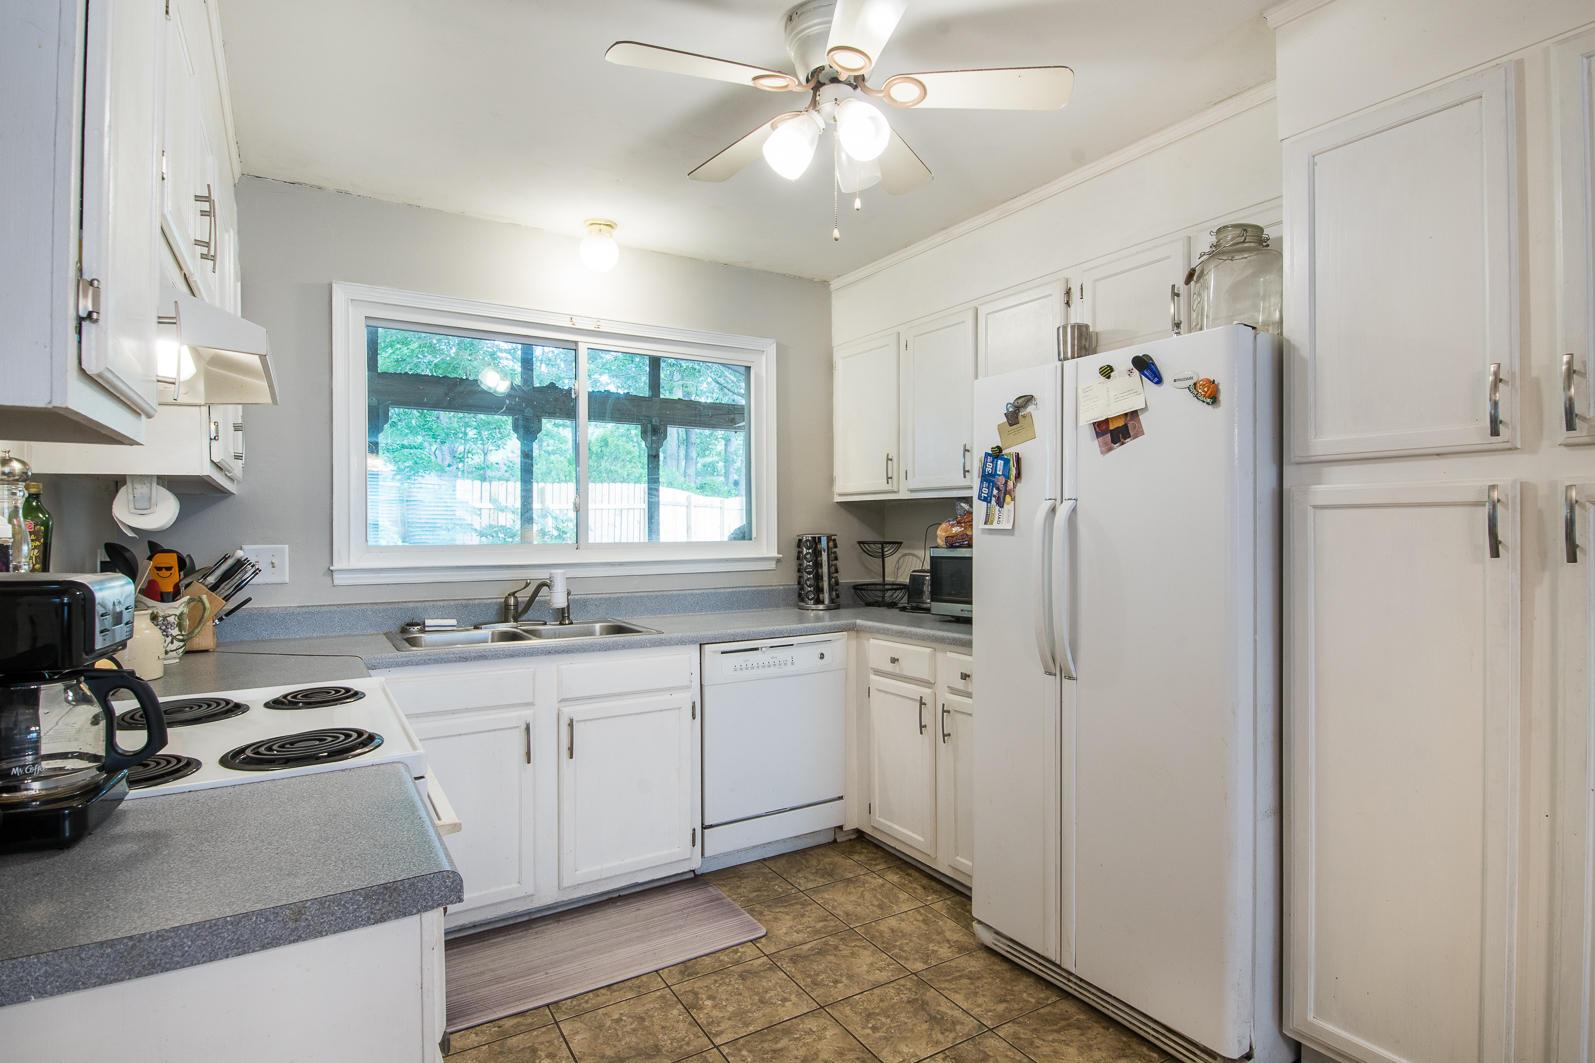 Wando East Homes For Sale - 1605 Babington, Mount Pleasant, SC - 23